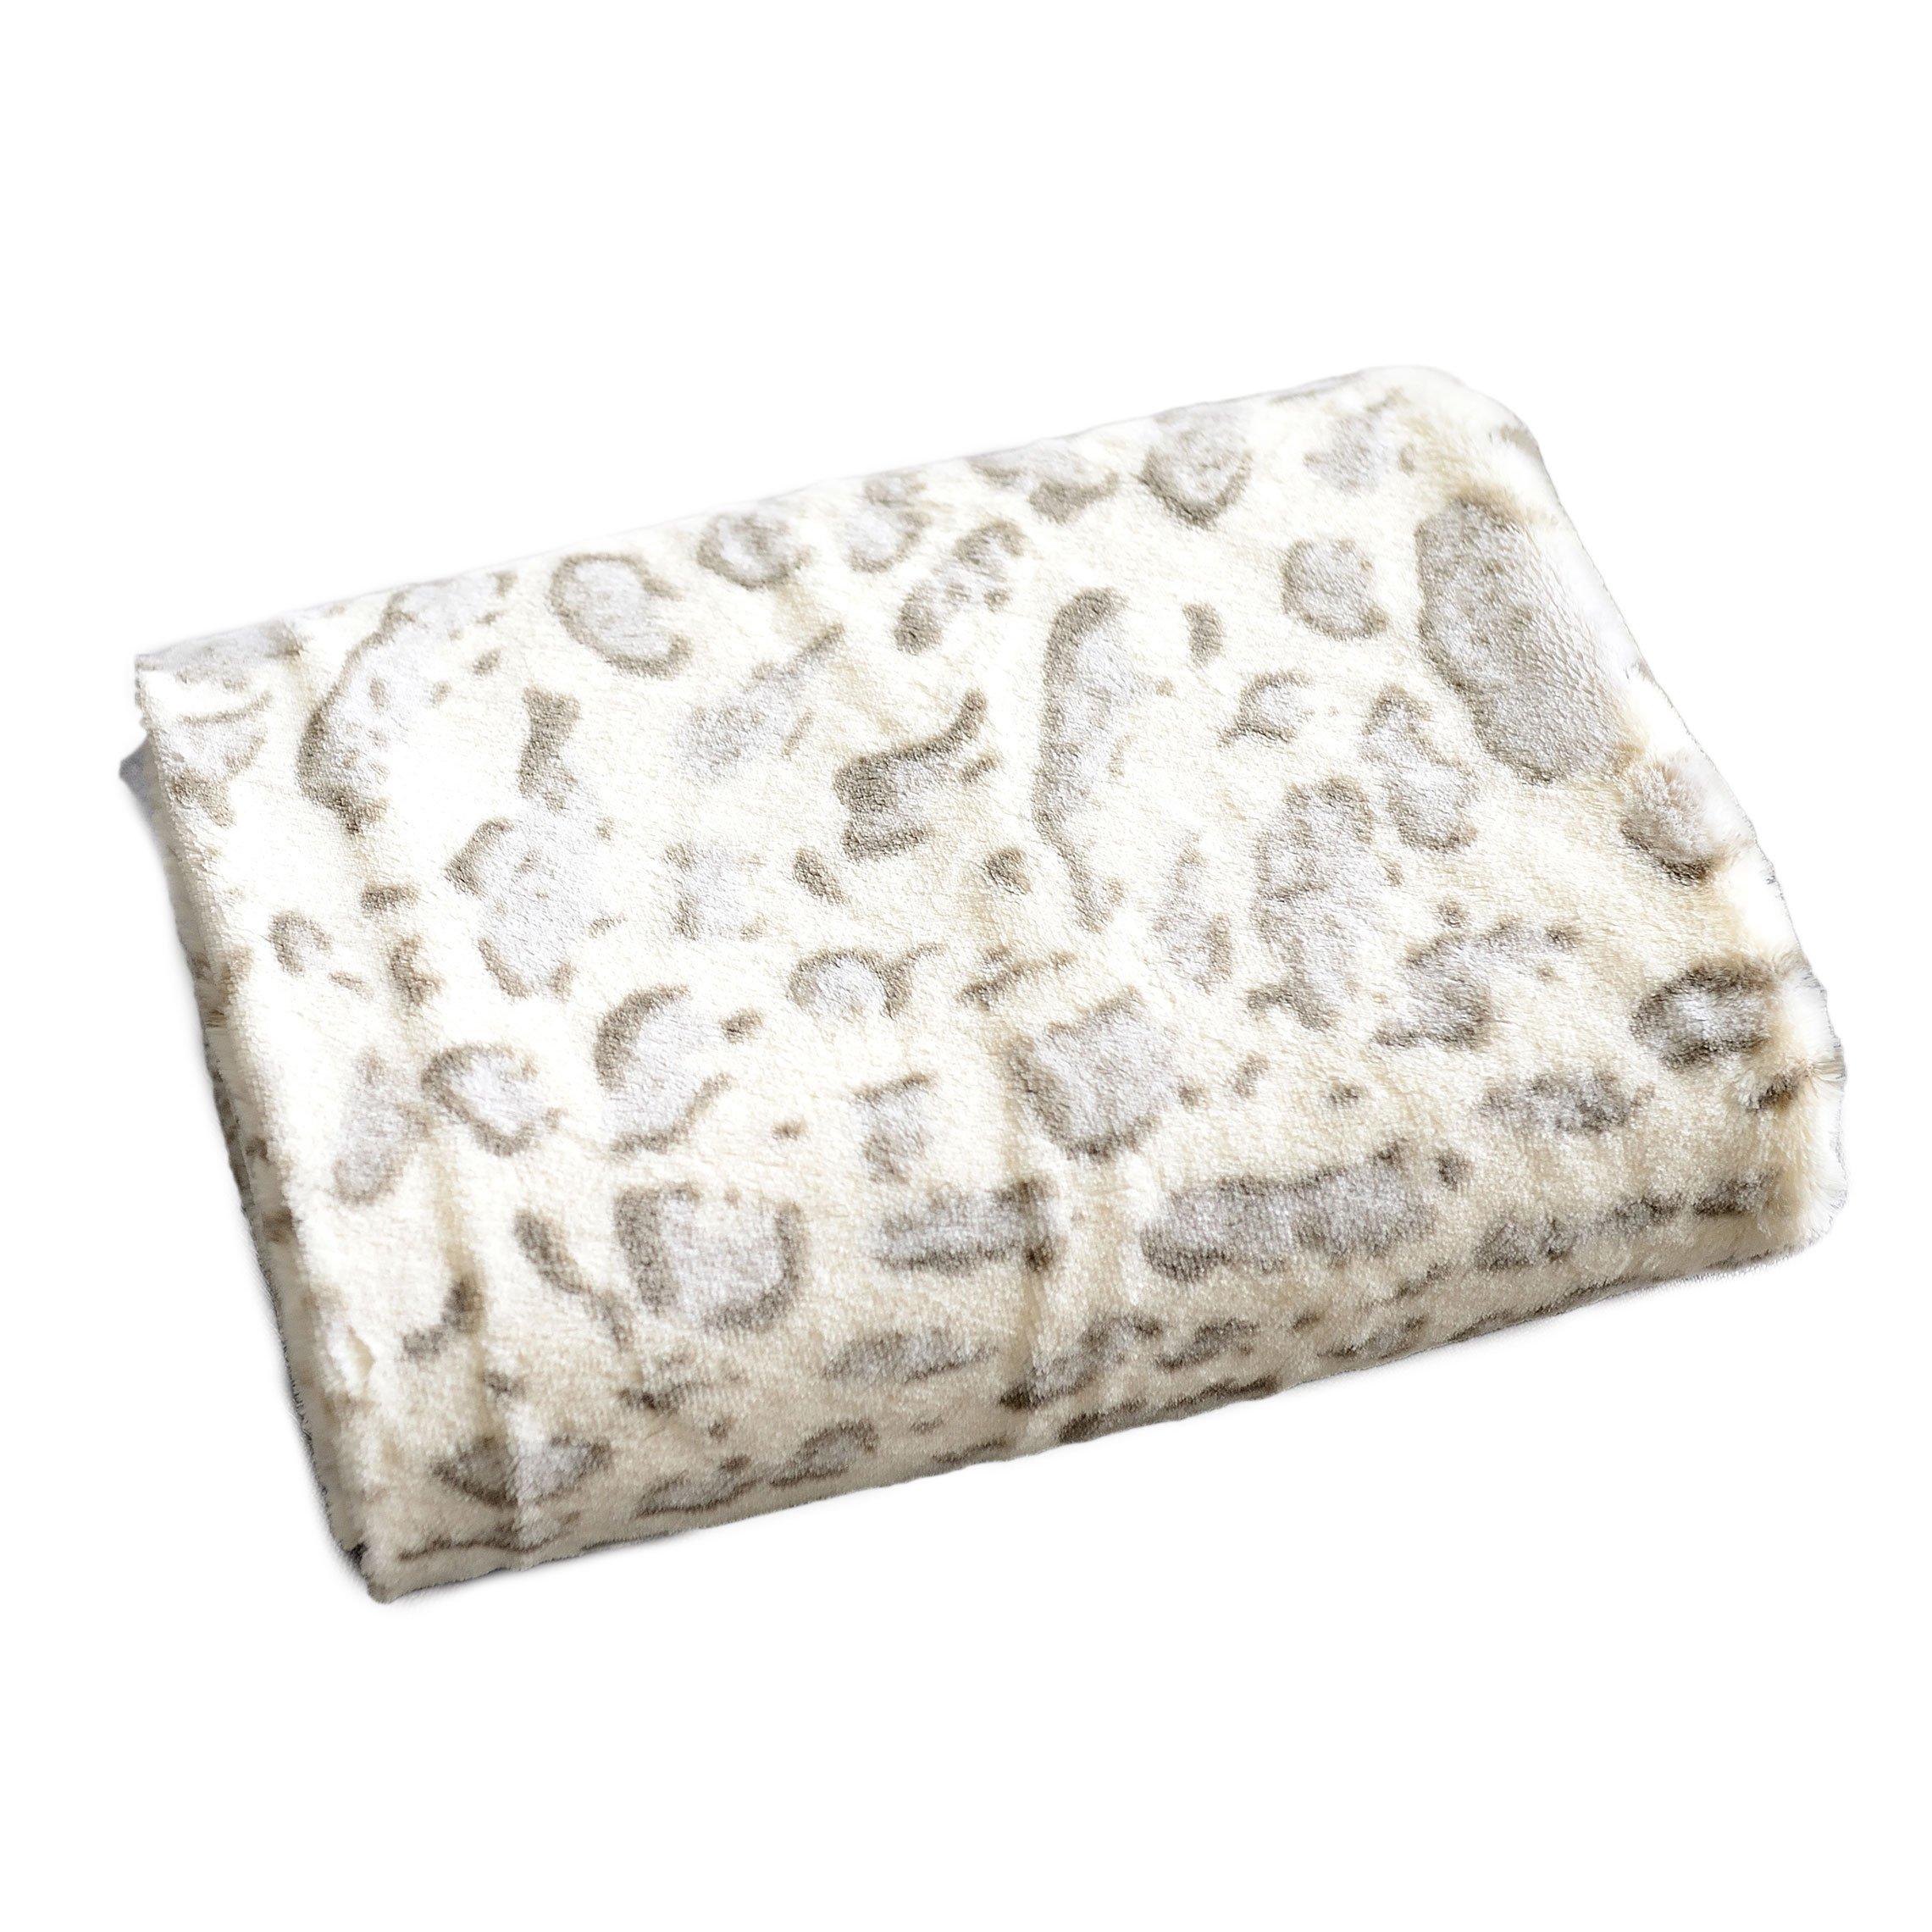 "Cheer Collection Animal Print Throw Blanket | Soft Velvety Faux Fur Microplush Reversible Cozy Warm Throw Blanket - 50"" x 60"" - Snow Leopard"